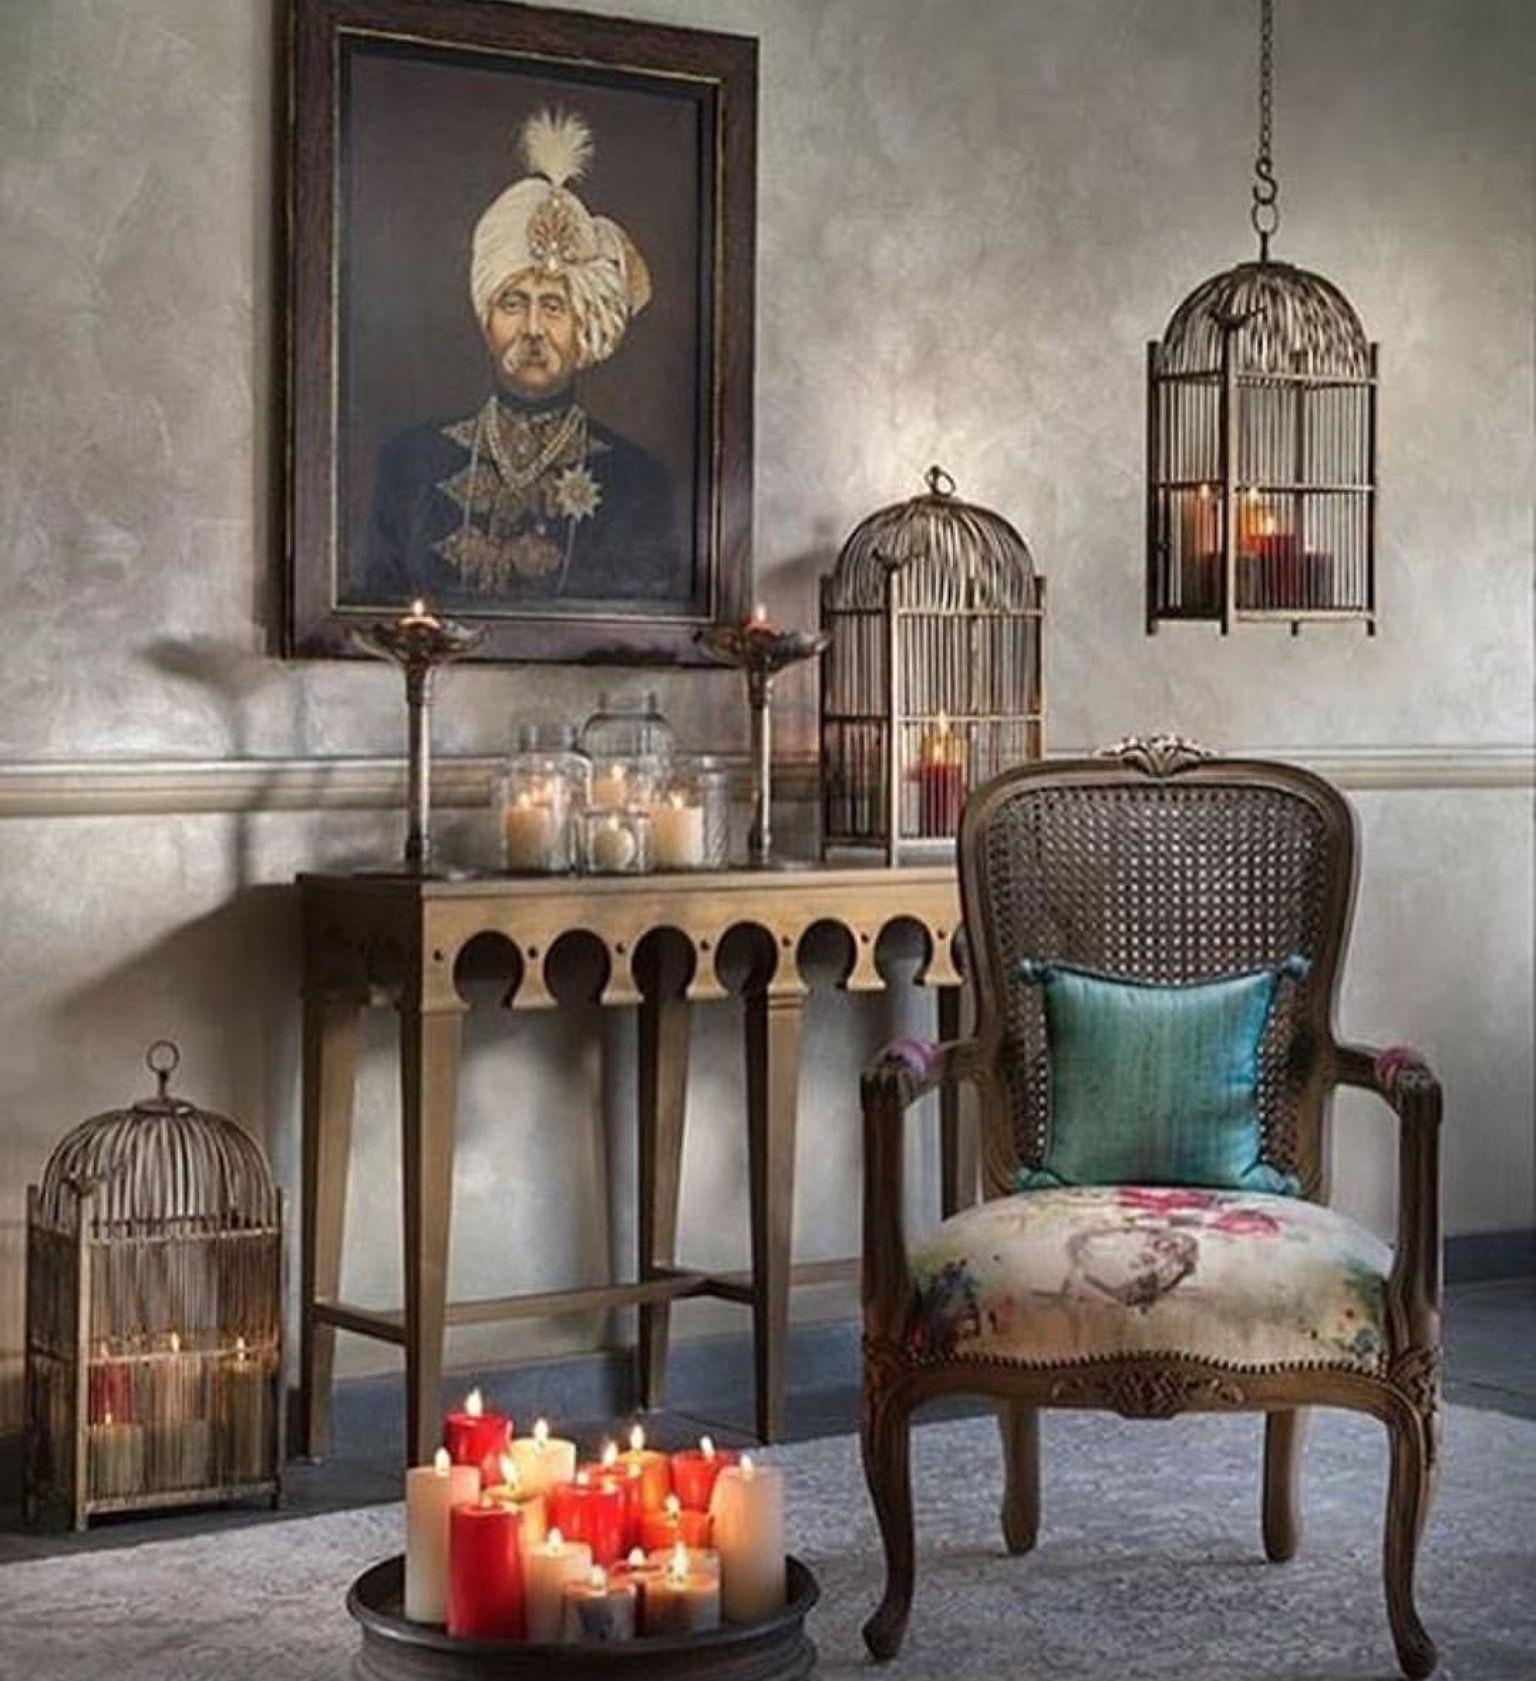 Pin De Ruchi Puri En Antique N Distressed Pinterest Estilo # Muebles Noticias